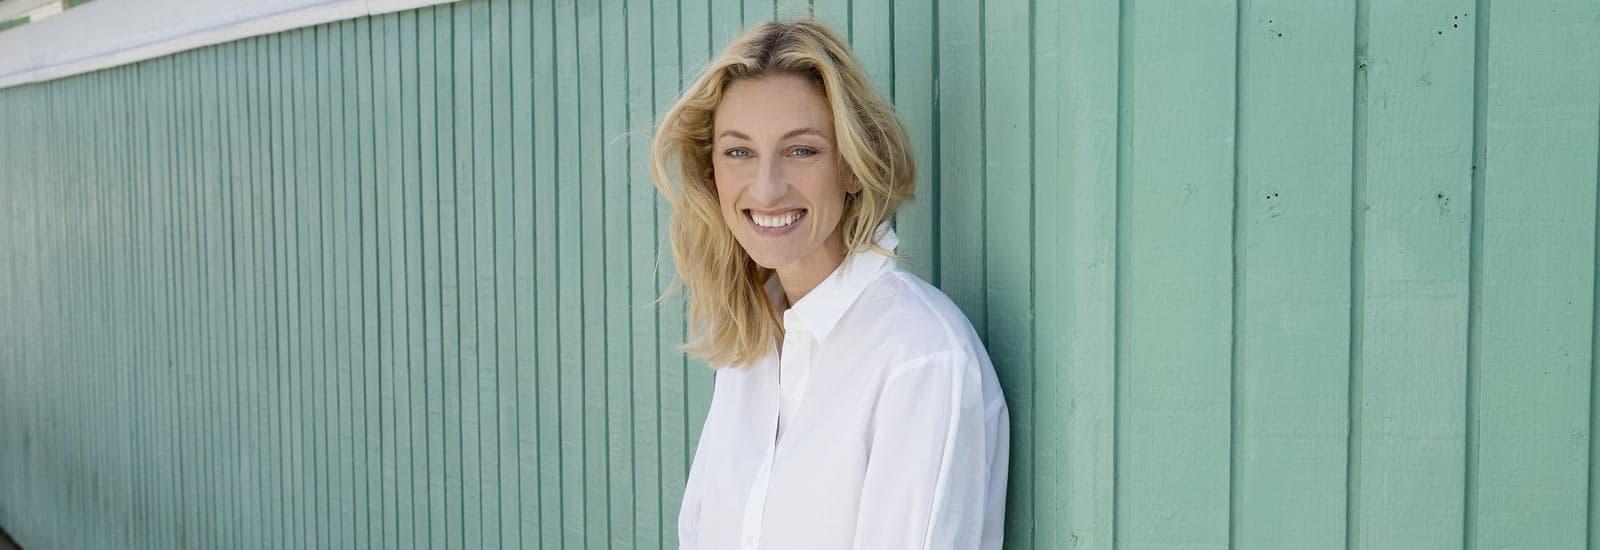 Annemette Voss foredrag